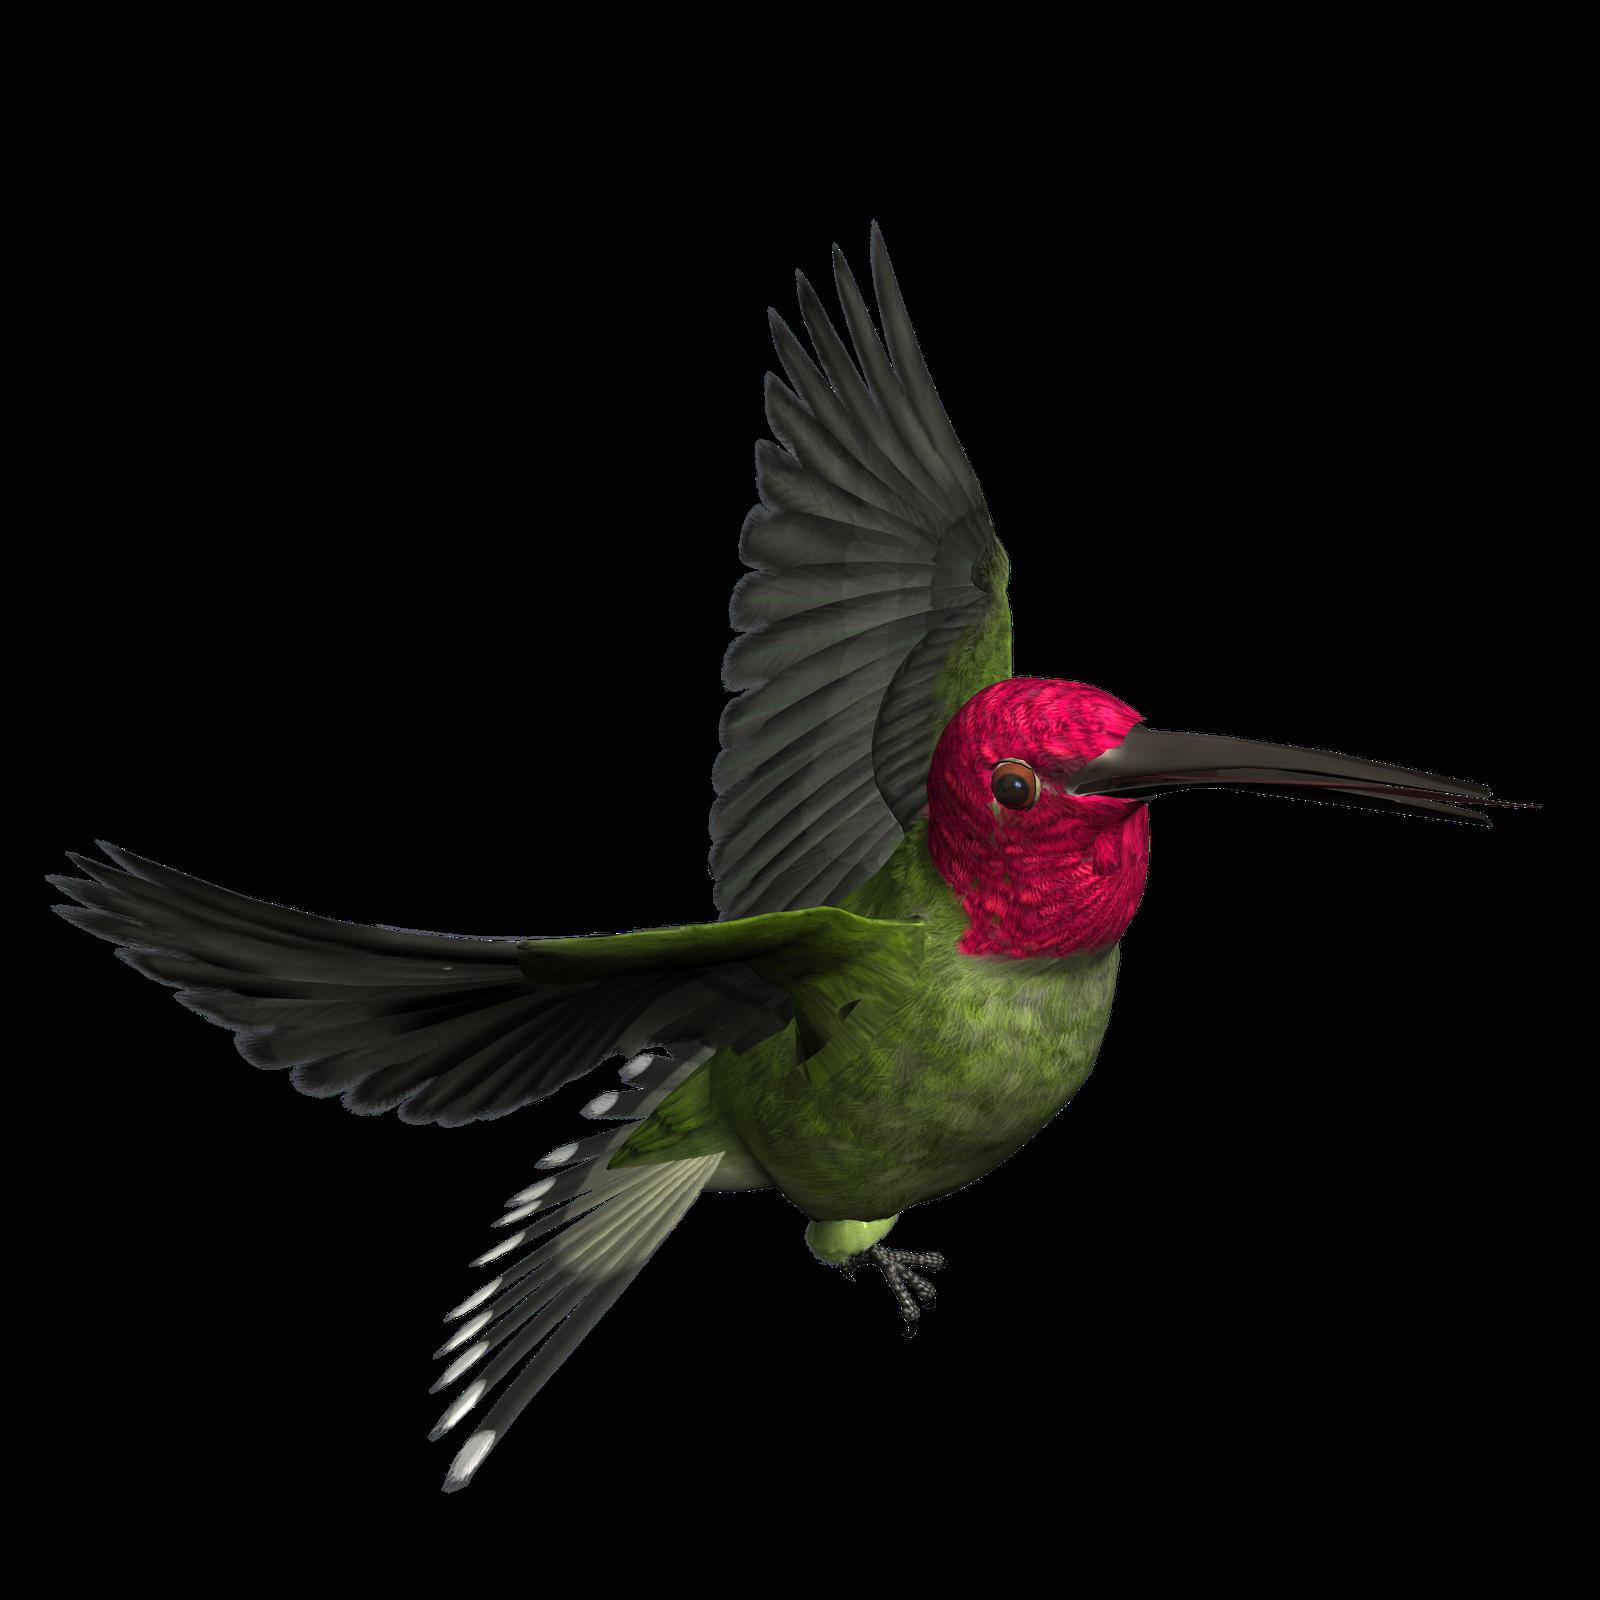 bird png graphics